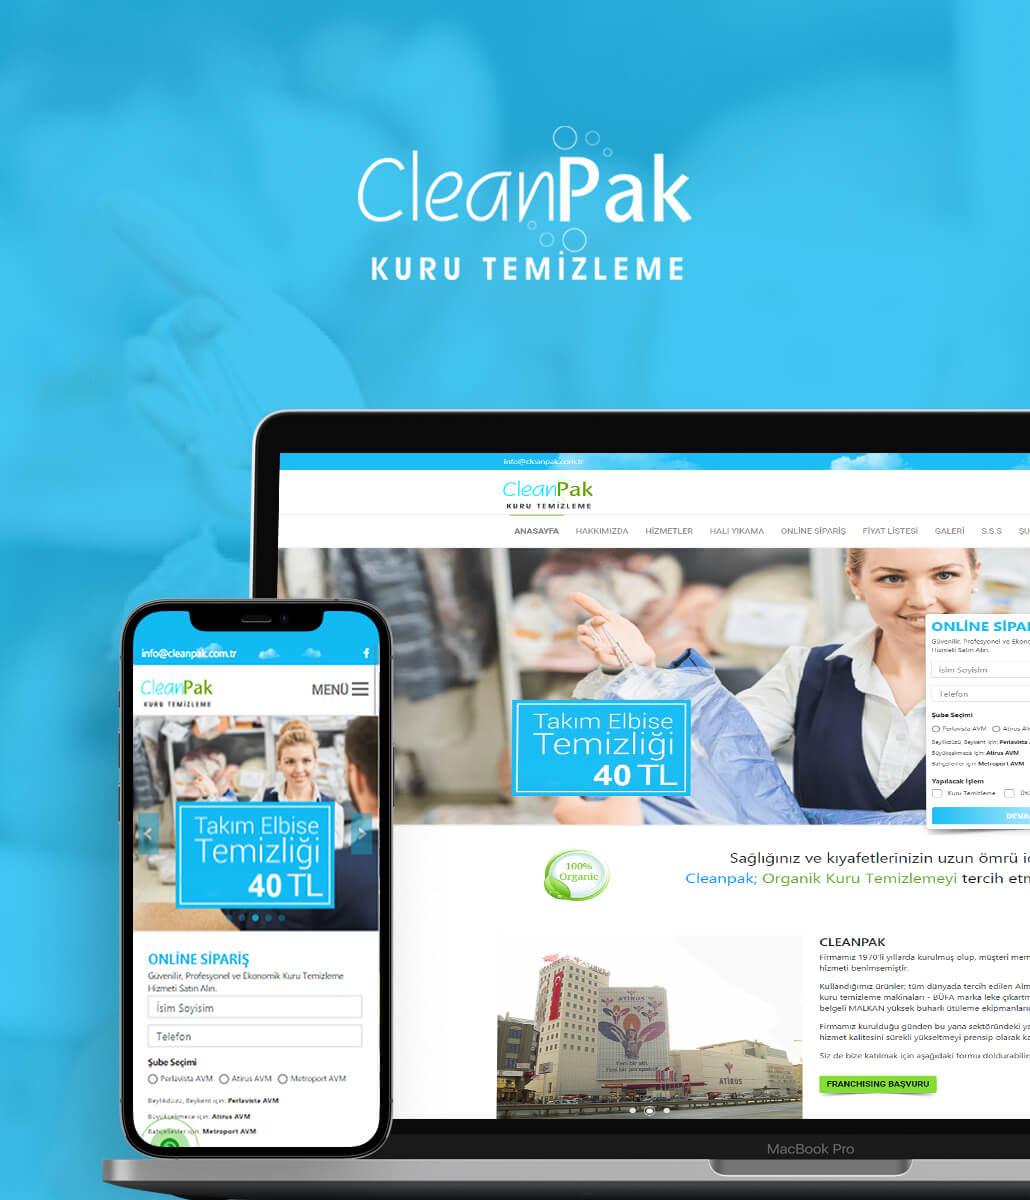 CleanPak Kurumsal Web Sitesi